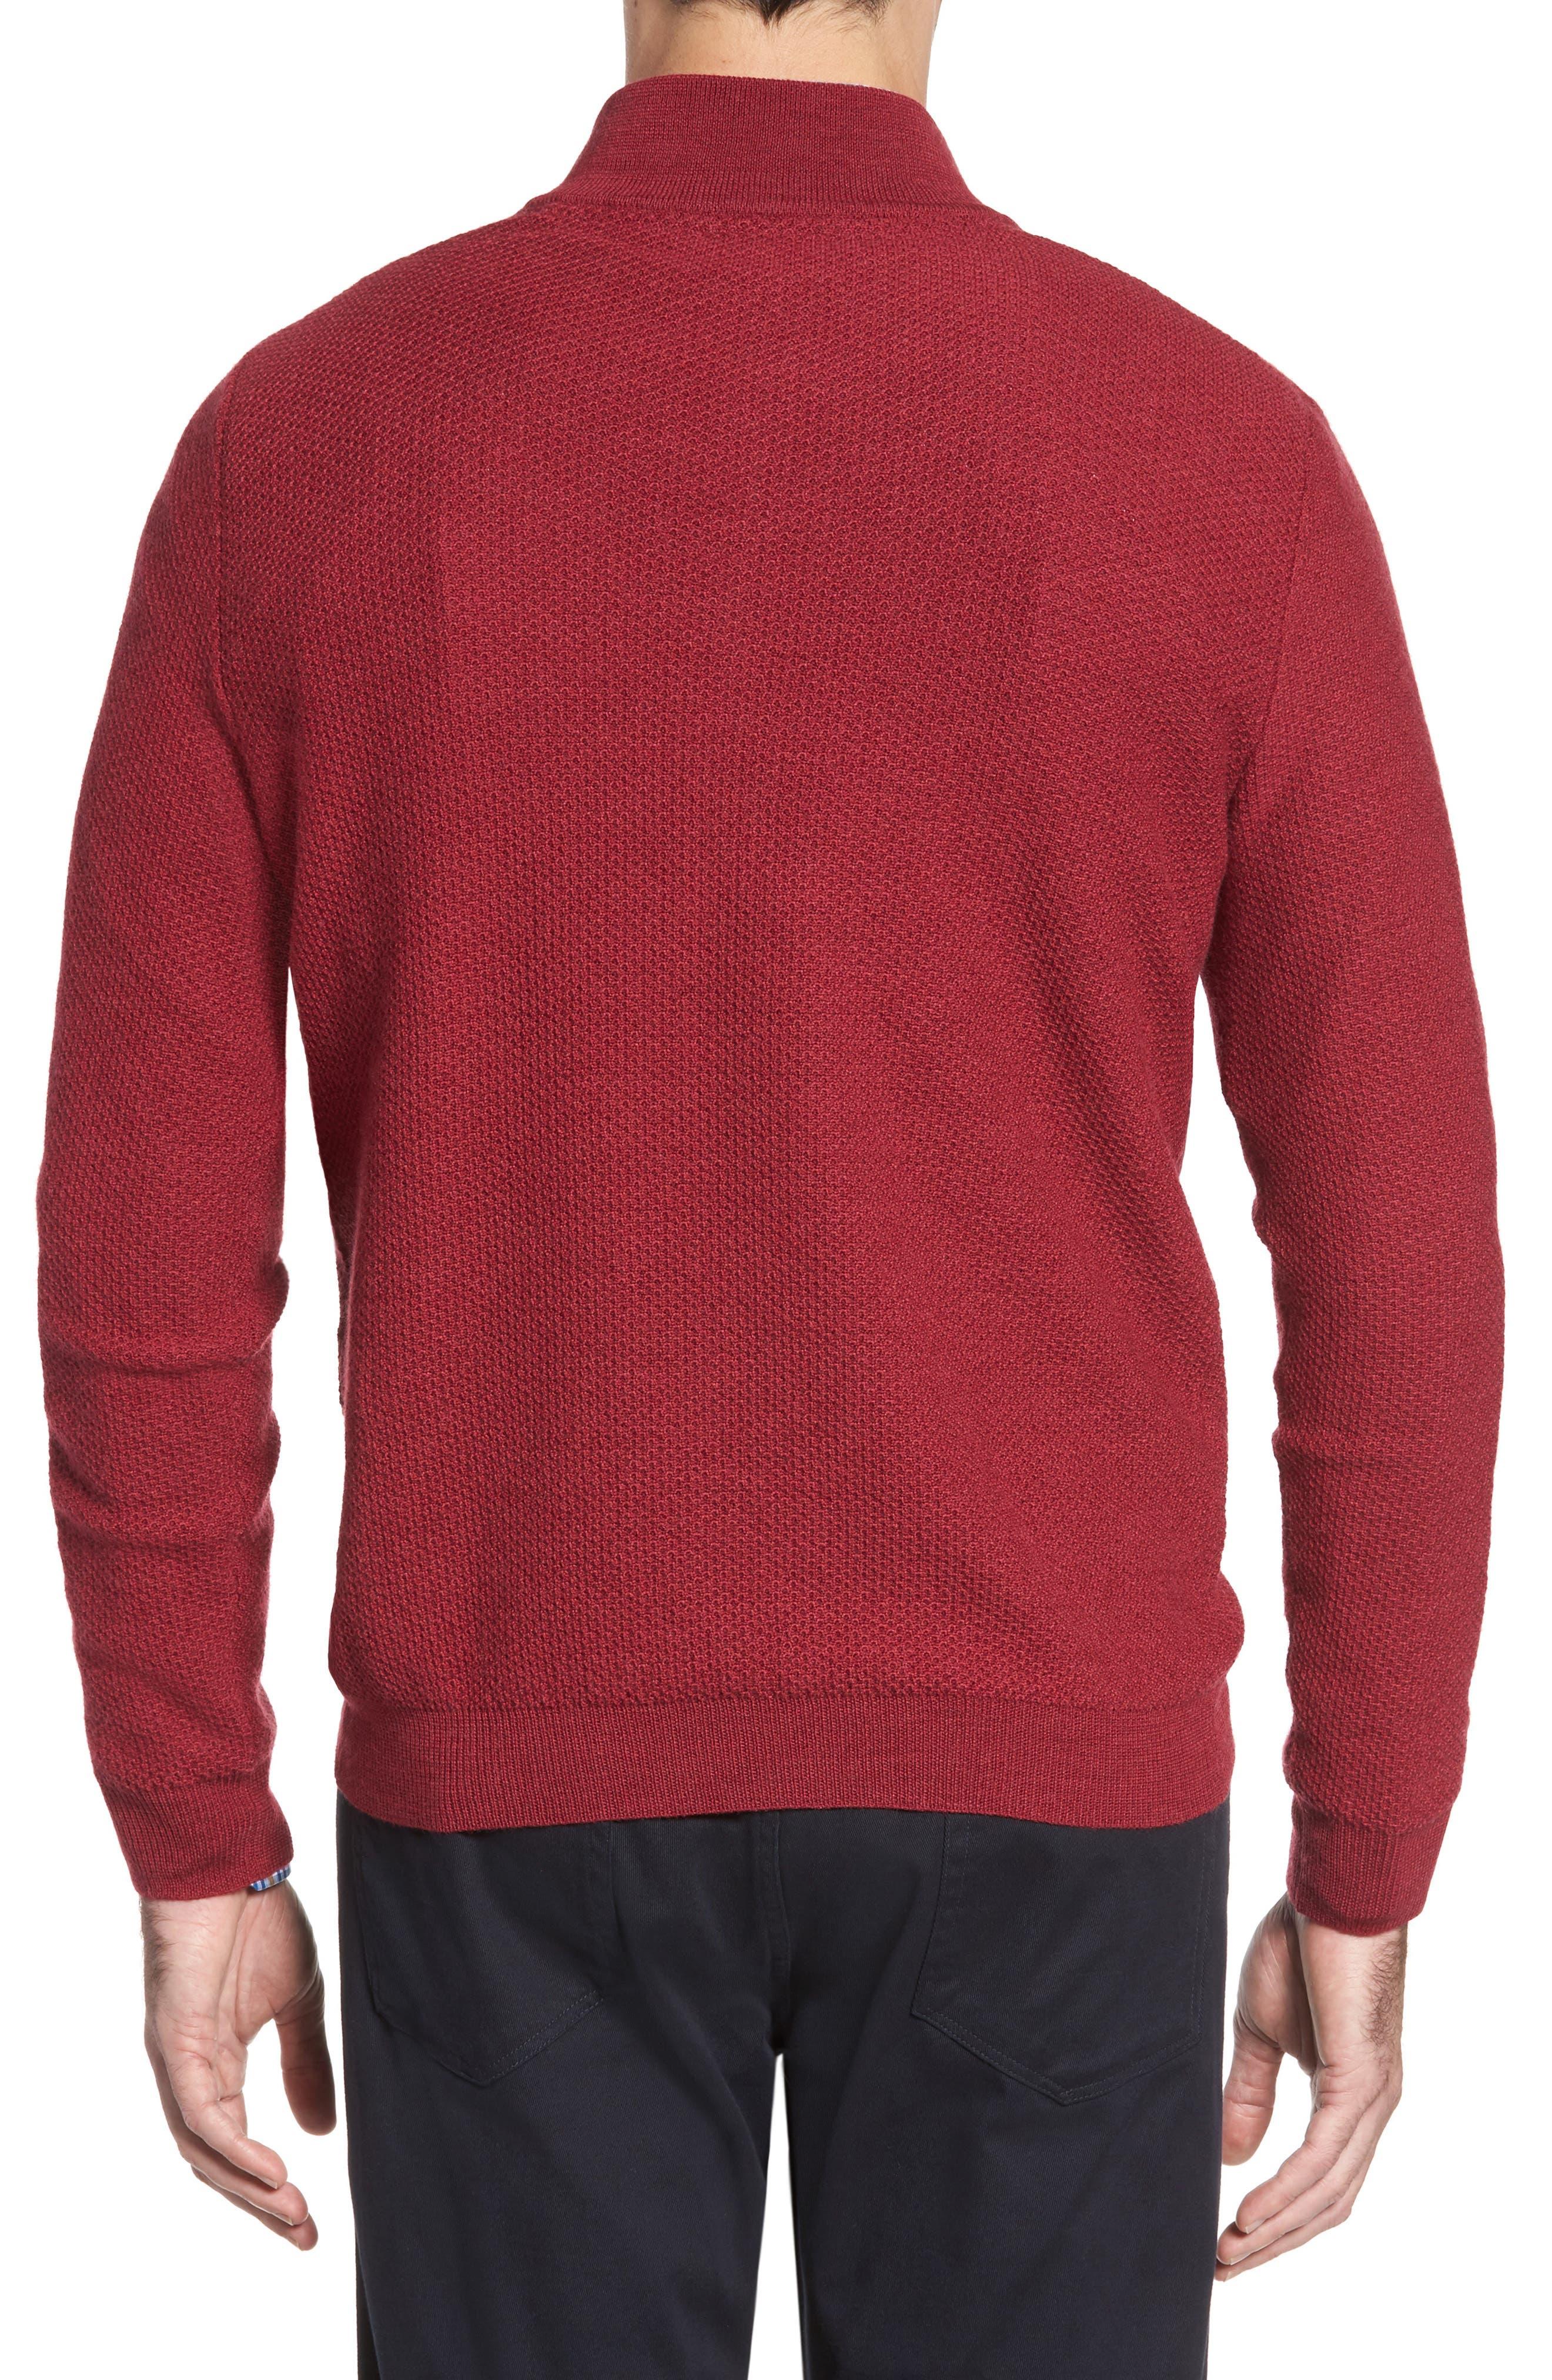 Honeycomb Merino Wool Quarter Zip Pullover,                             Alternate thumbnail 6, color,